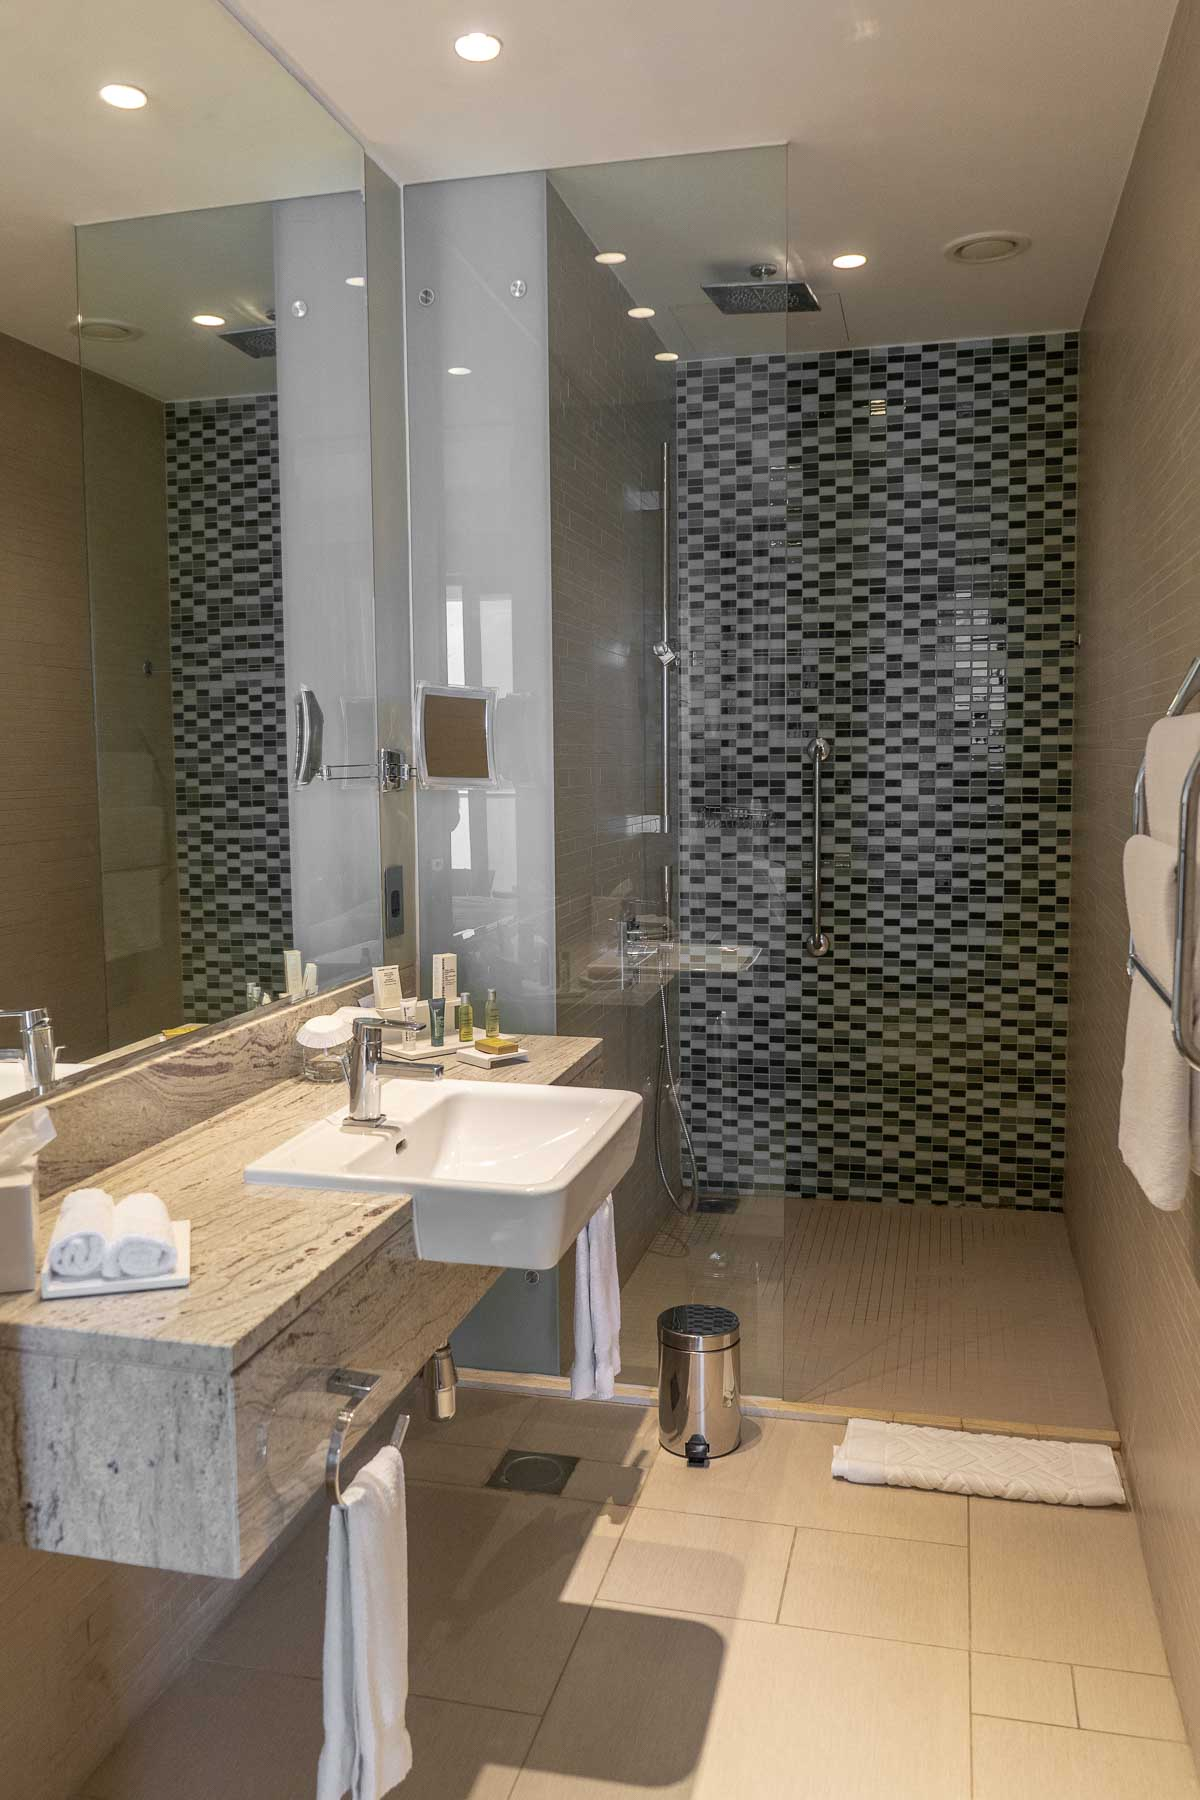 Bathroom at the Hilton Dead Sea Resort & Spa in Jordan